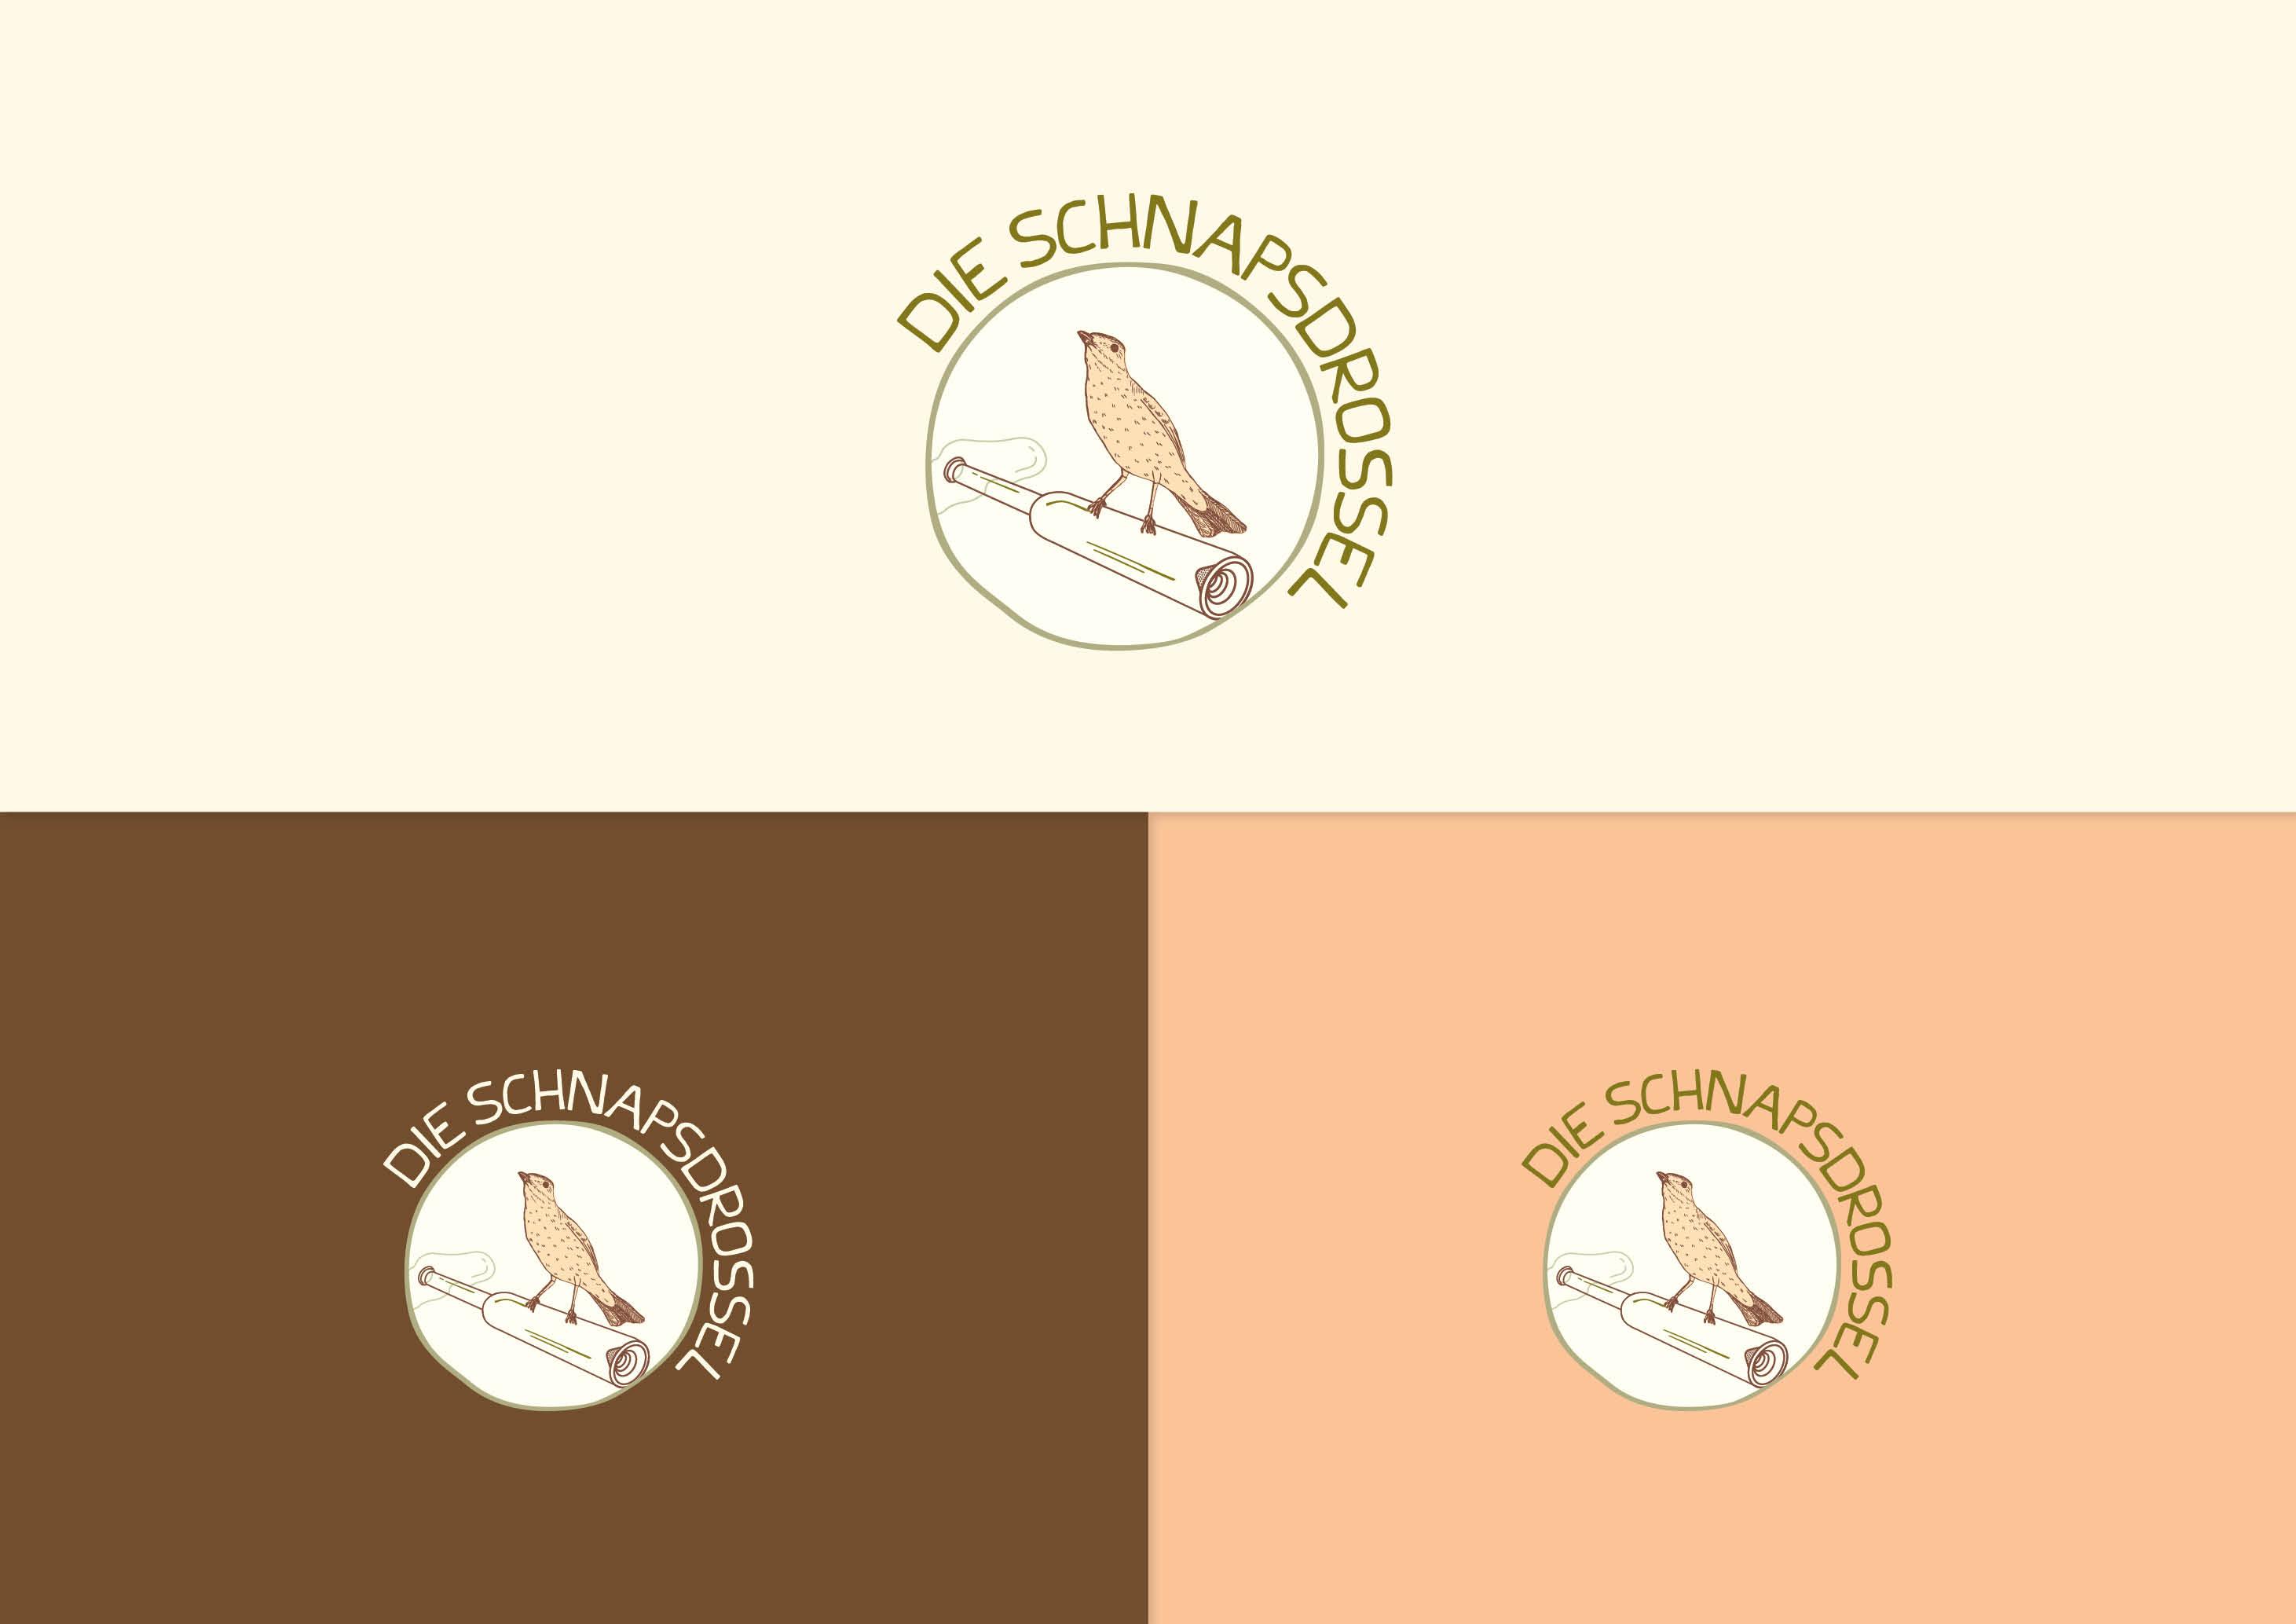 Die Schnapsdrossel Brand Identity (Logo) by Magdalena Weiss